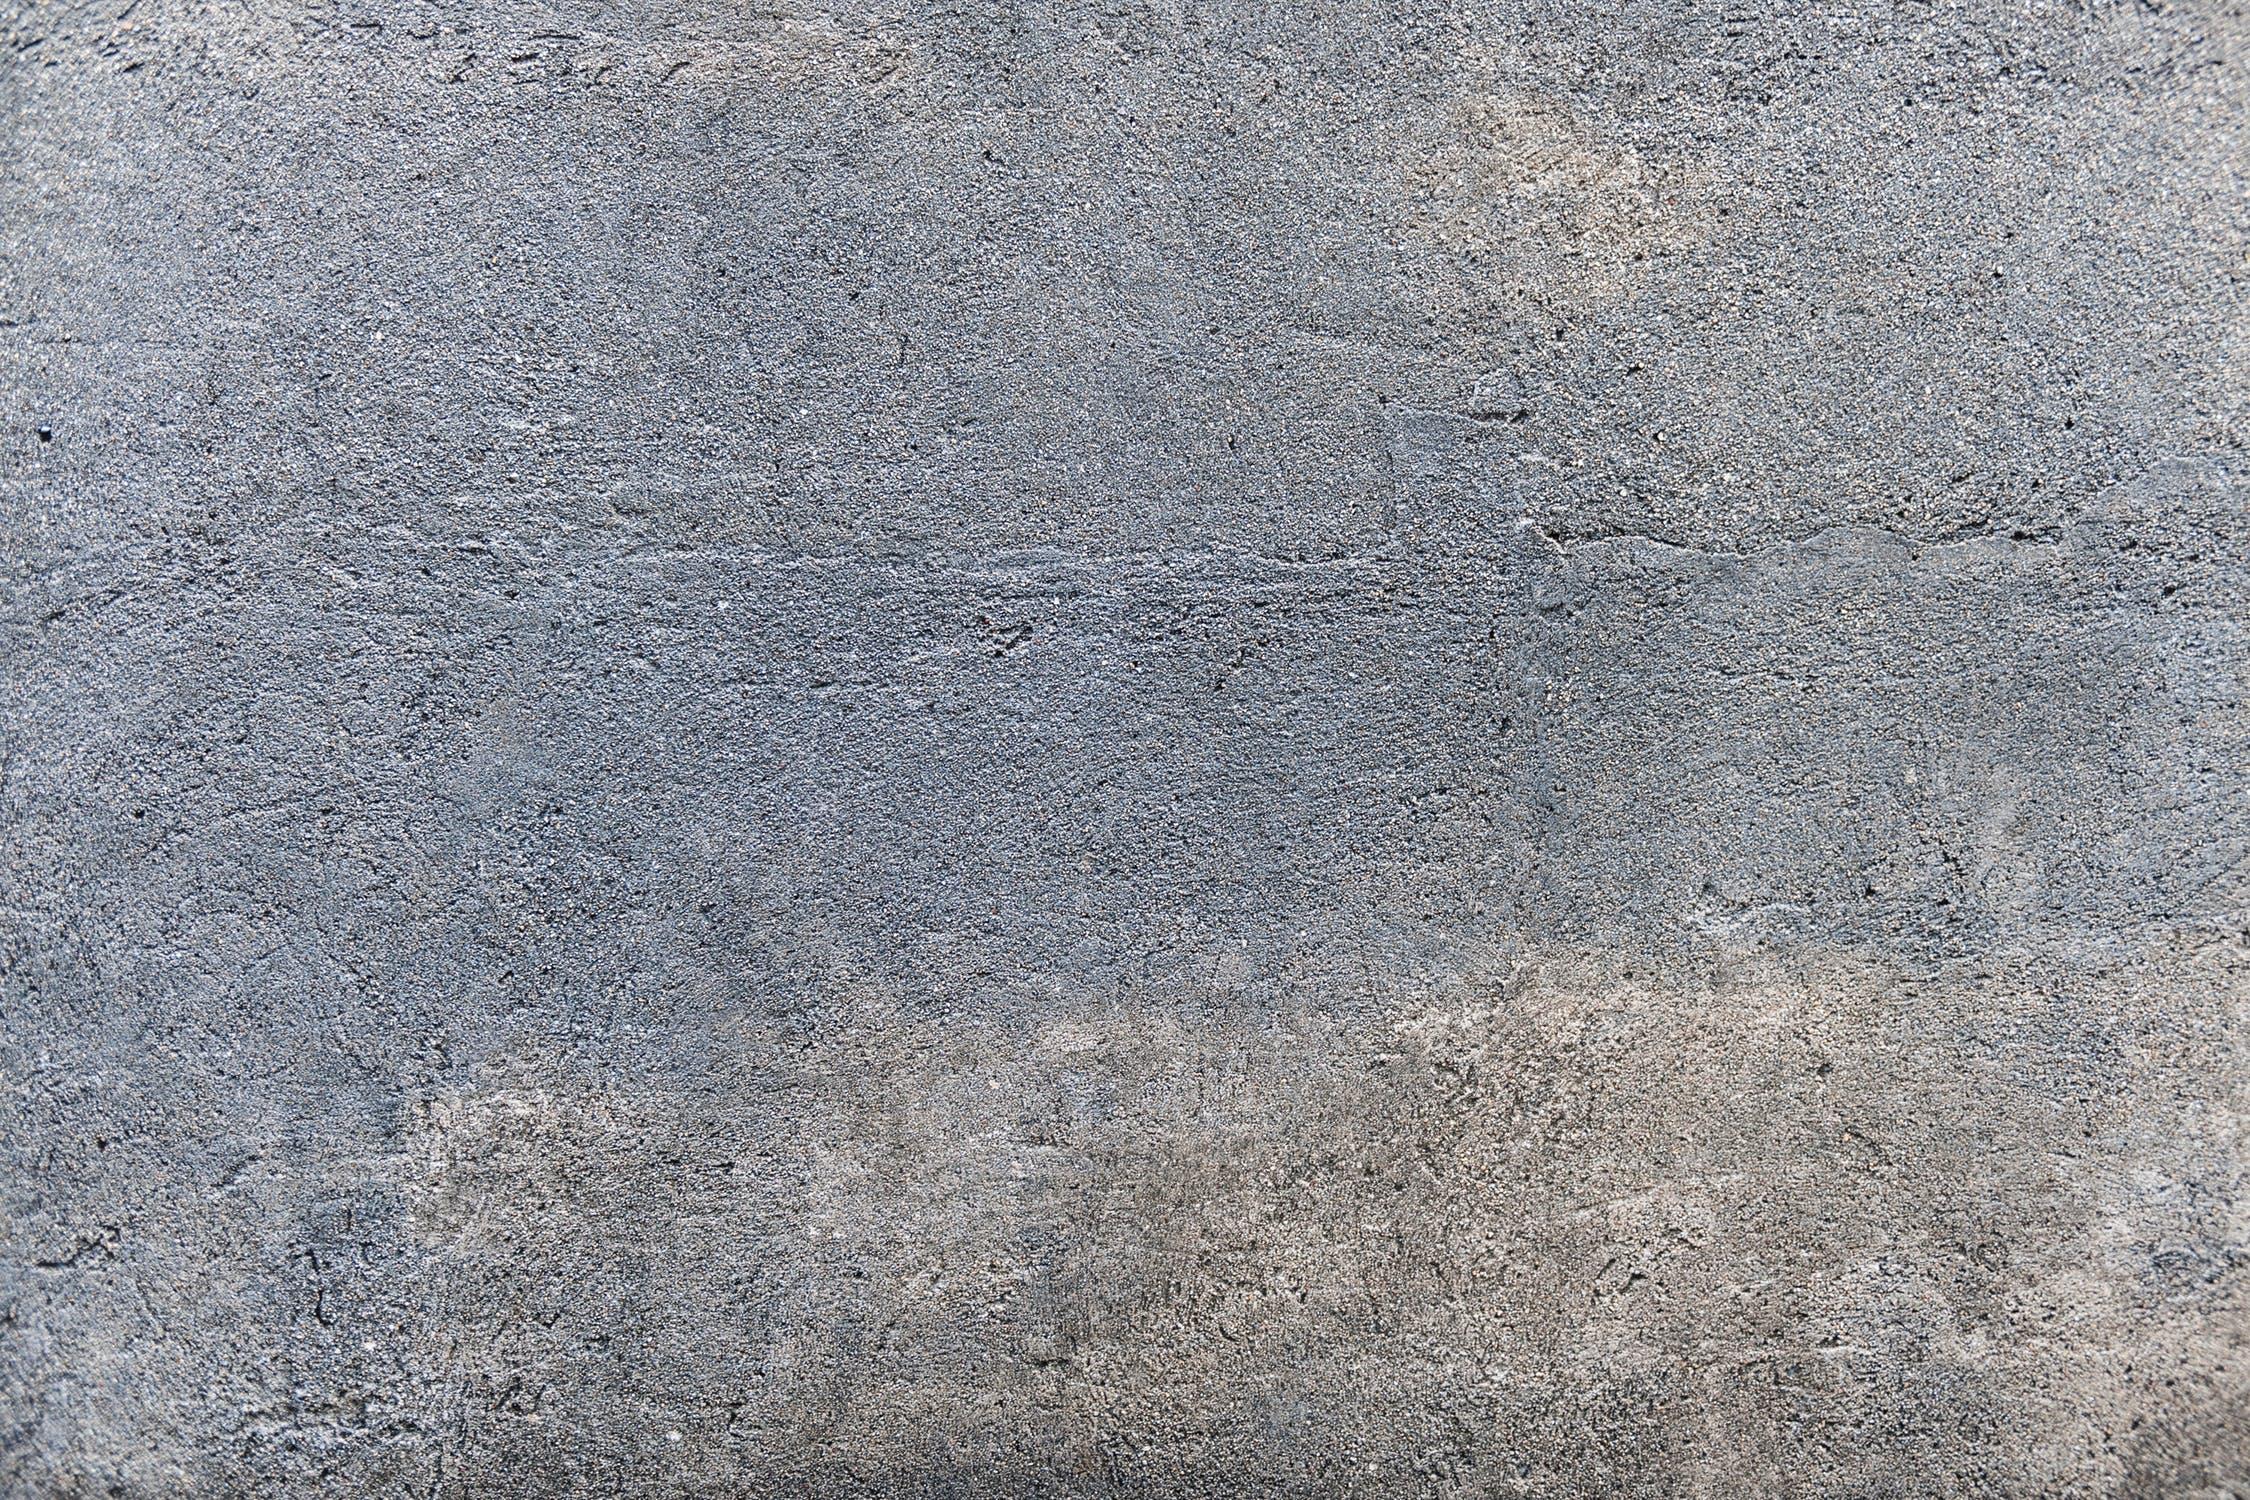 Houston Concrete Supply